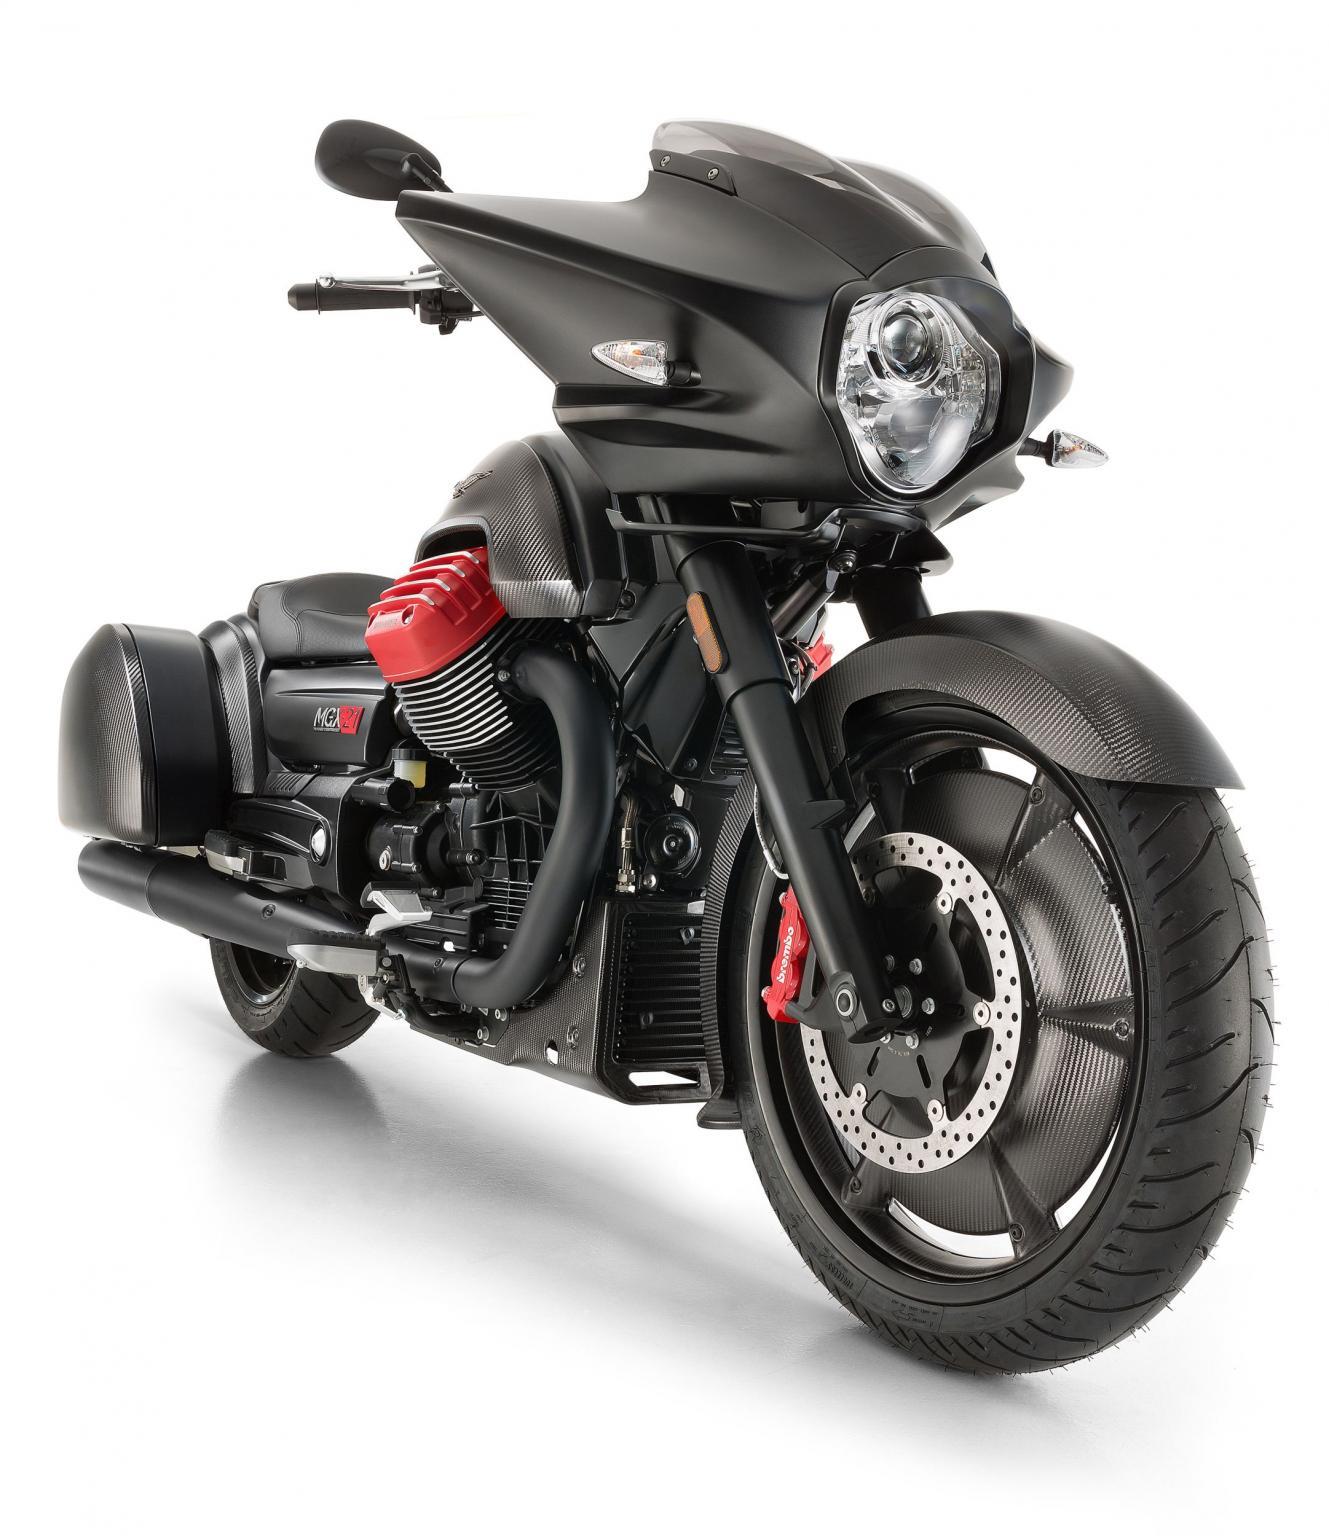 moto guzzi mgx 21 flying fortress test 2016 motorrad fotos. Black Bedroom Furniture Sets. Home Design Ideas